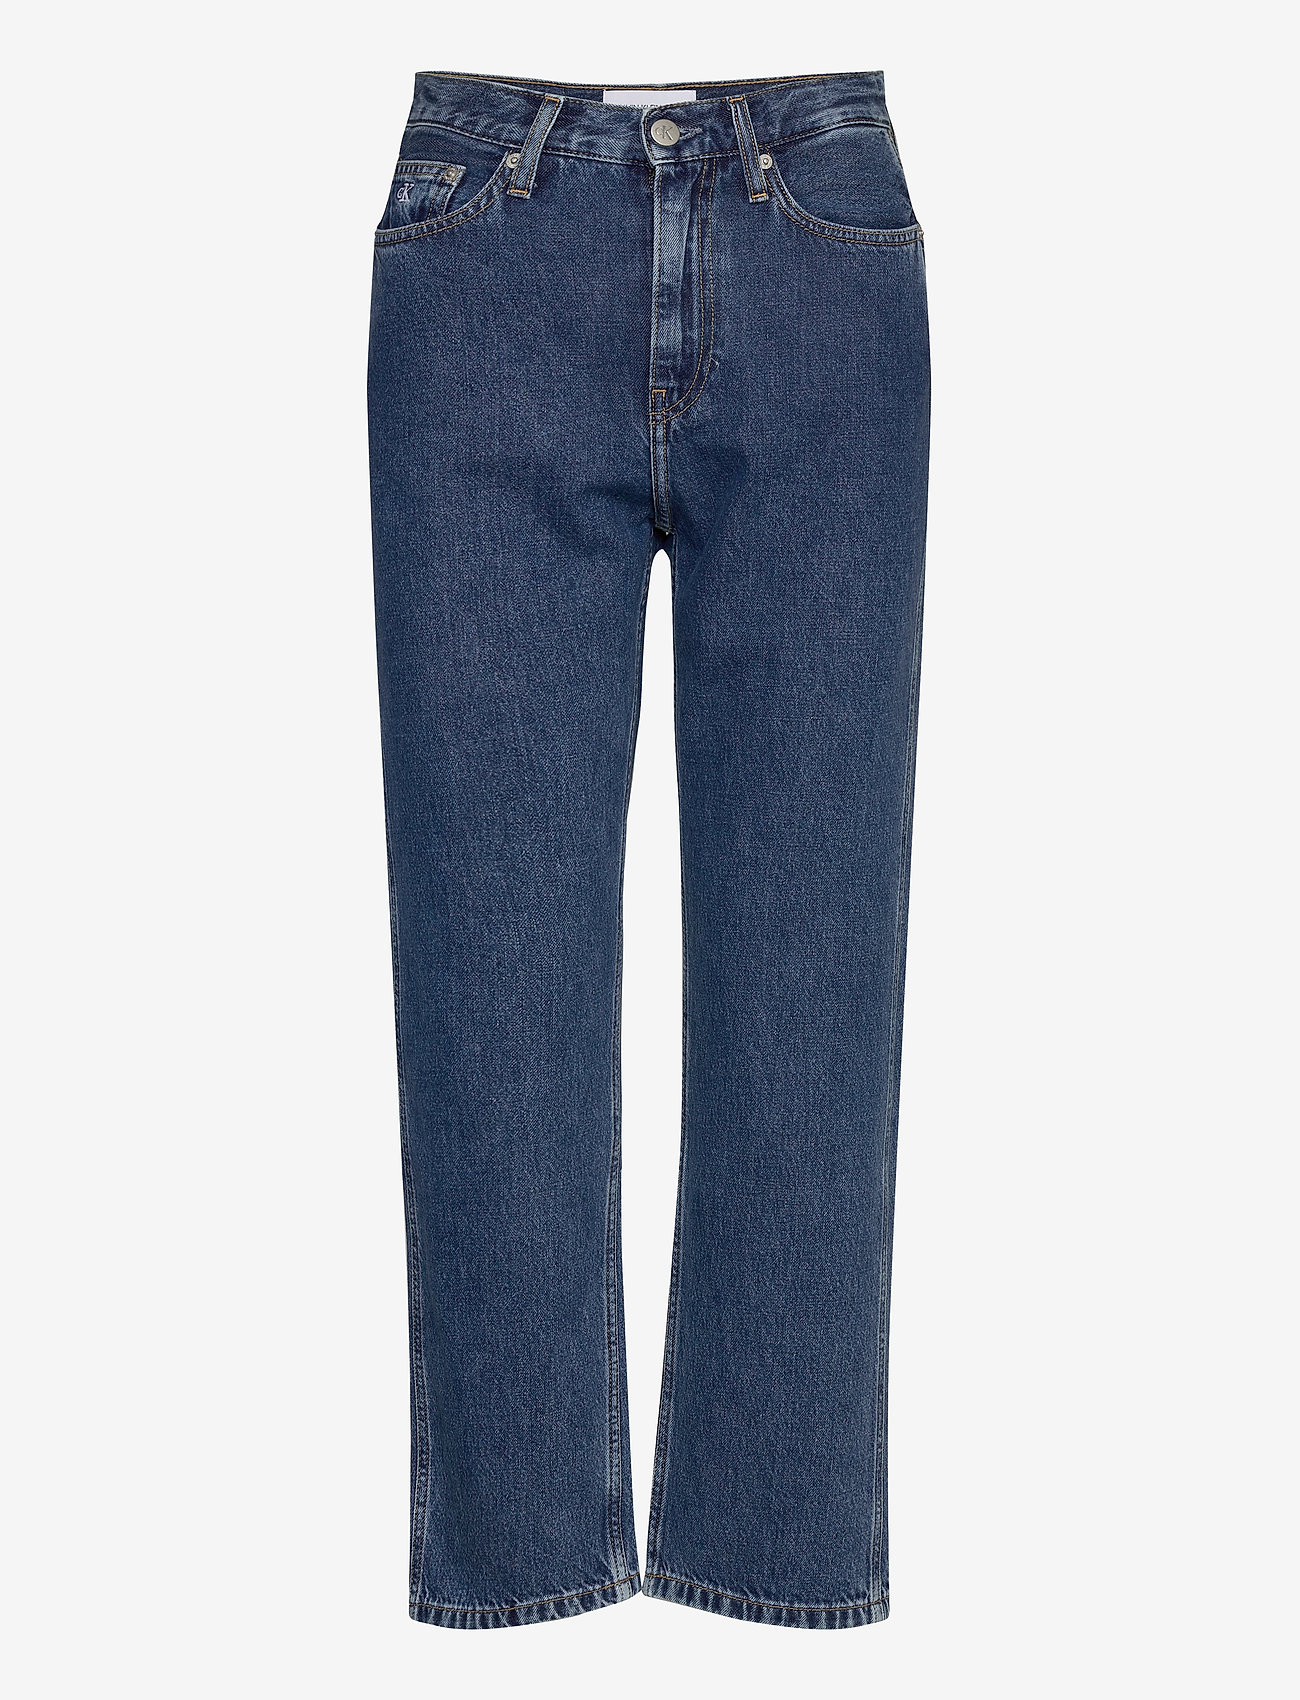 Calvin Klein Jeans - CKJ 030 HIGH RISE STRAIGHT ANKLE - mammajeans - ab076 icn light blue - 0